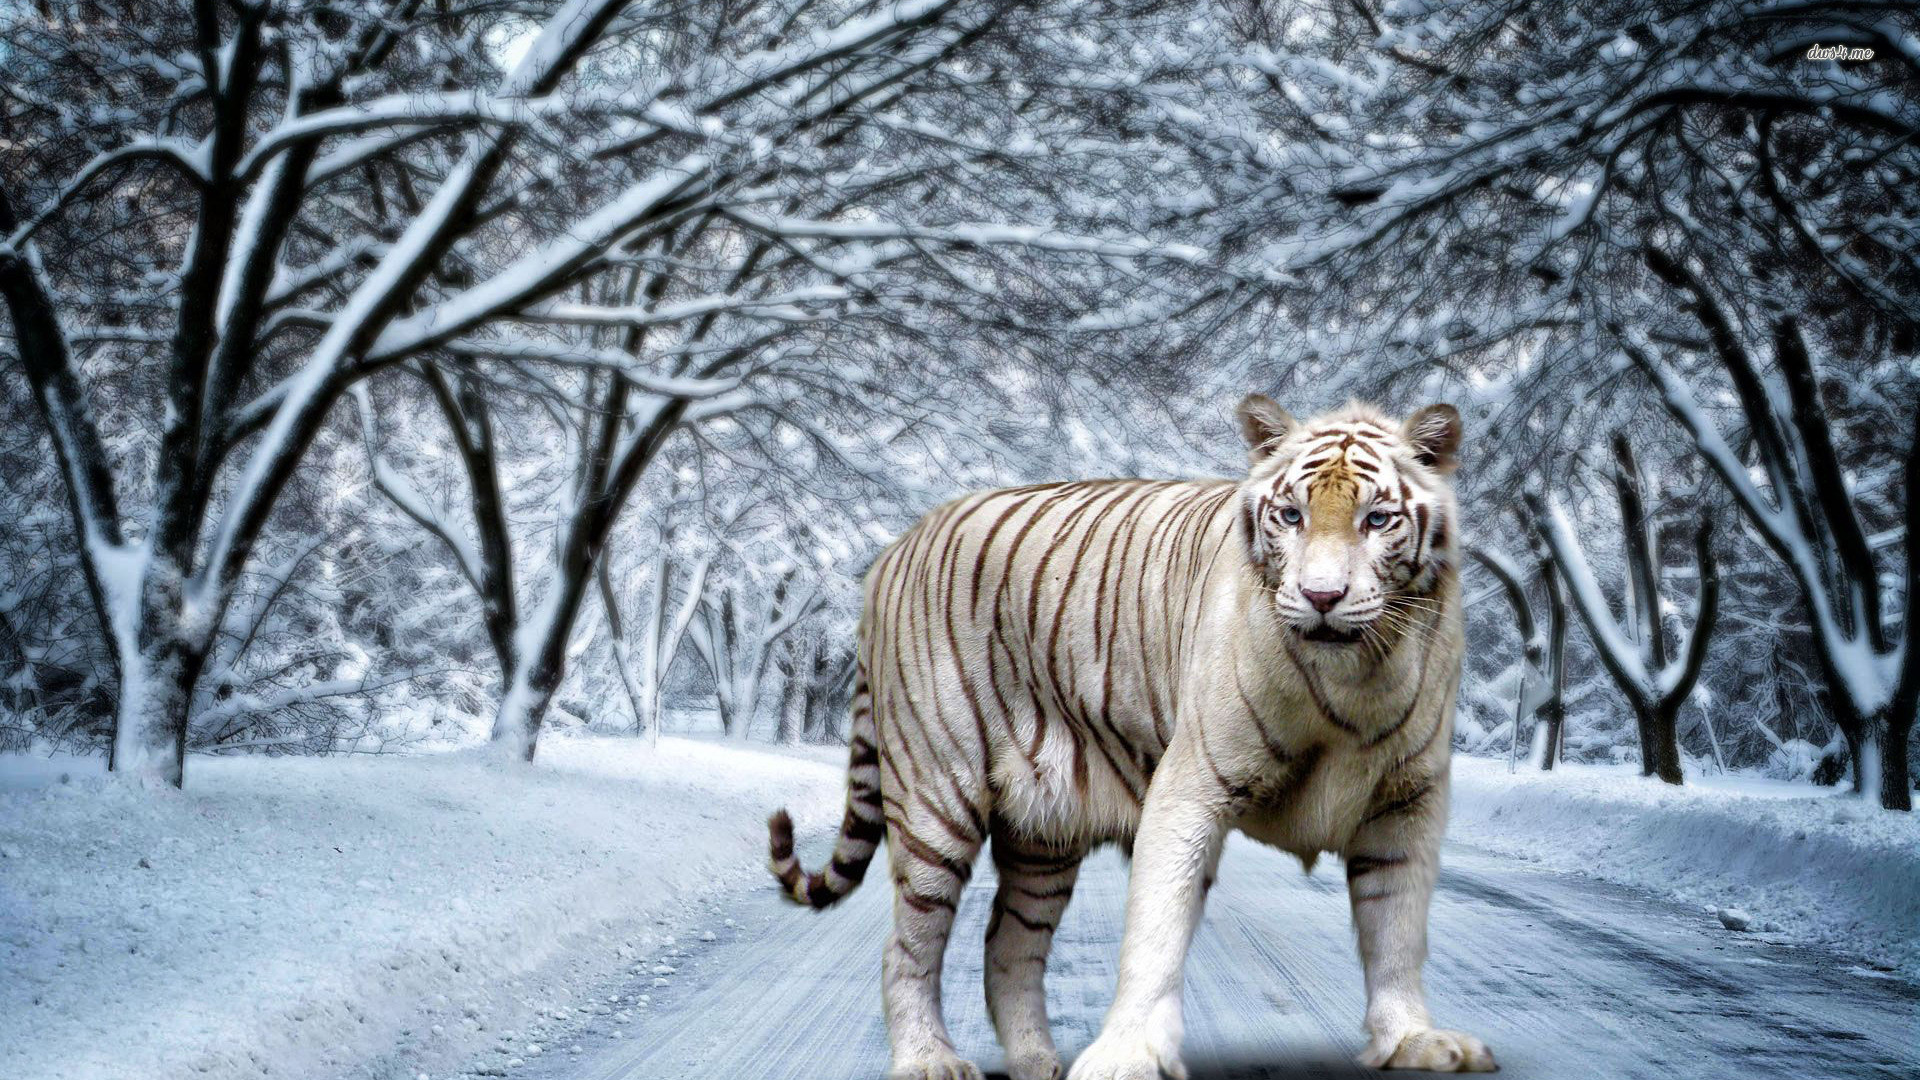 Tiger Desktop Wallpaper. Tiger Desktop Wallpaper 1920×1080